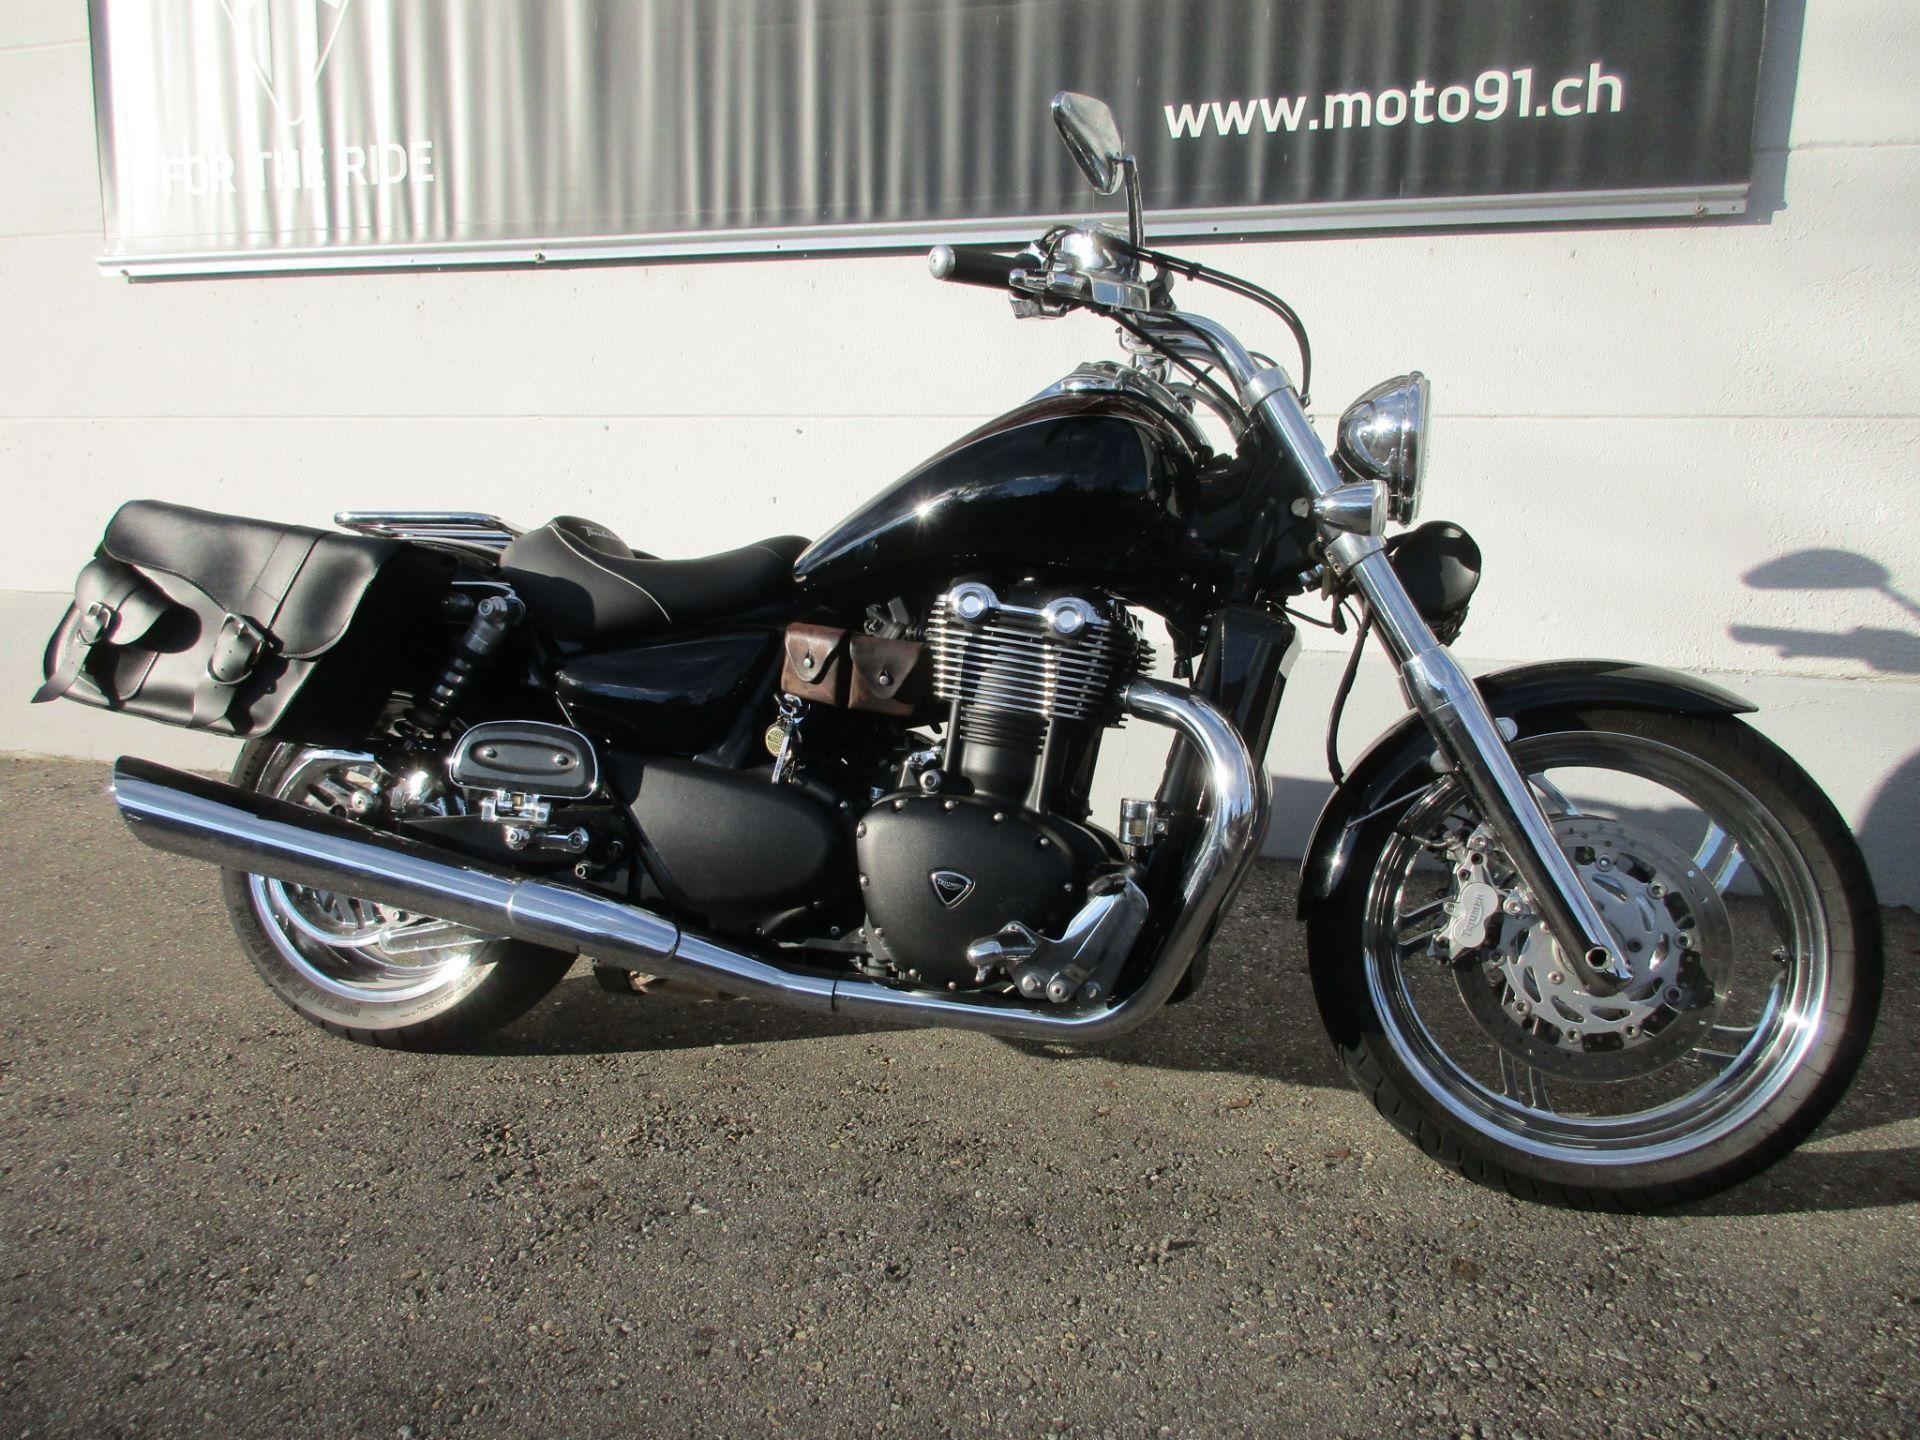 Motorrad Occasion Kaufen Triumph Thunderbird 1700 Moto 91 Ag Höri Id